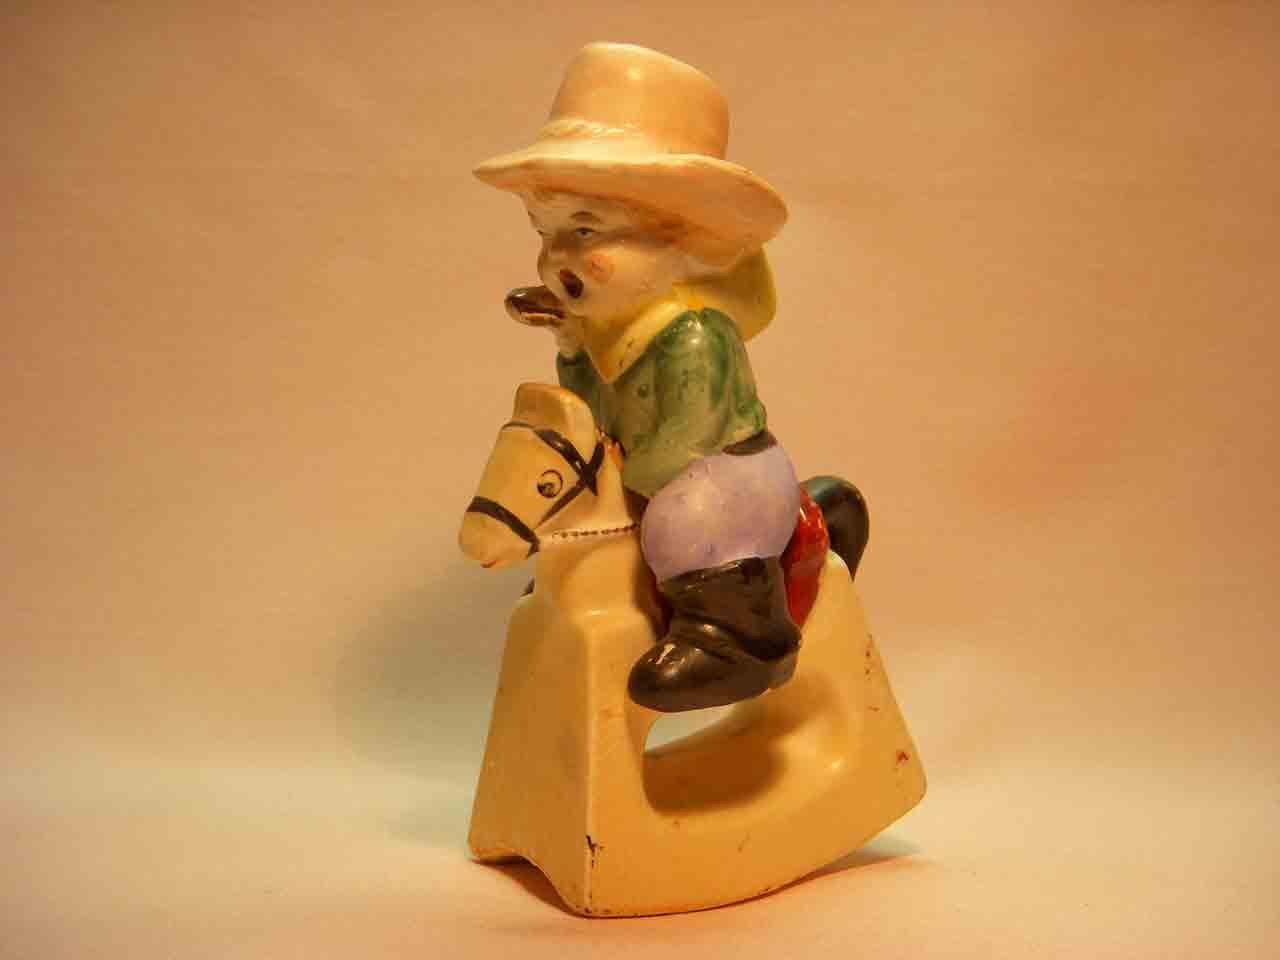 Cowboy kid on rocking horse salt and pepper shaker